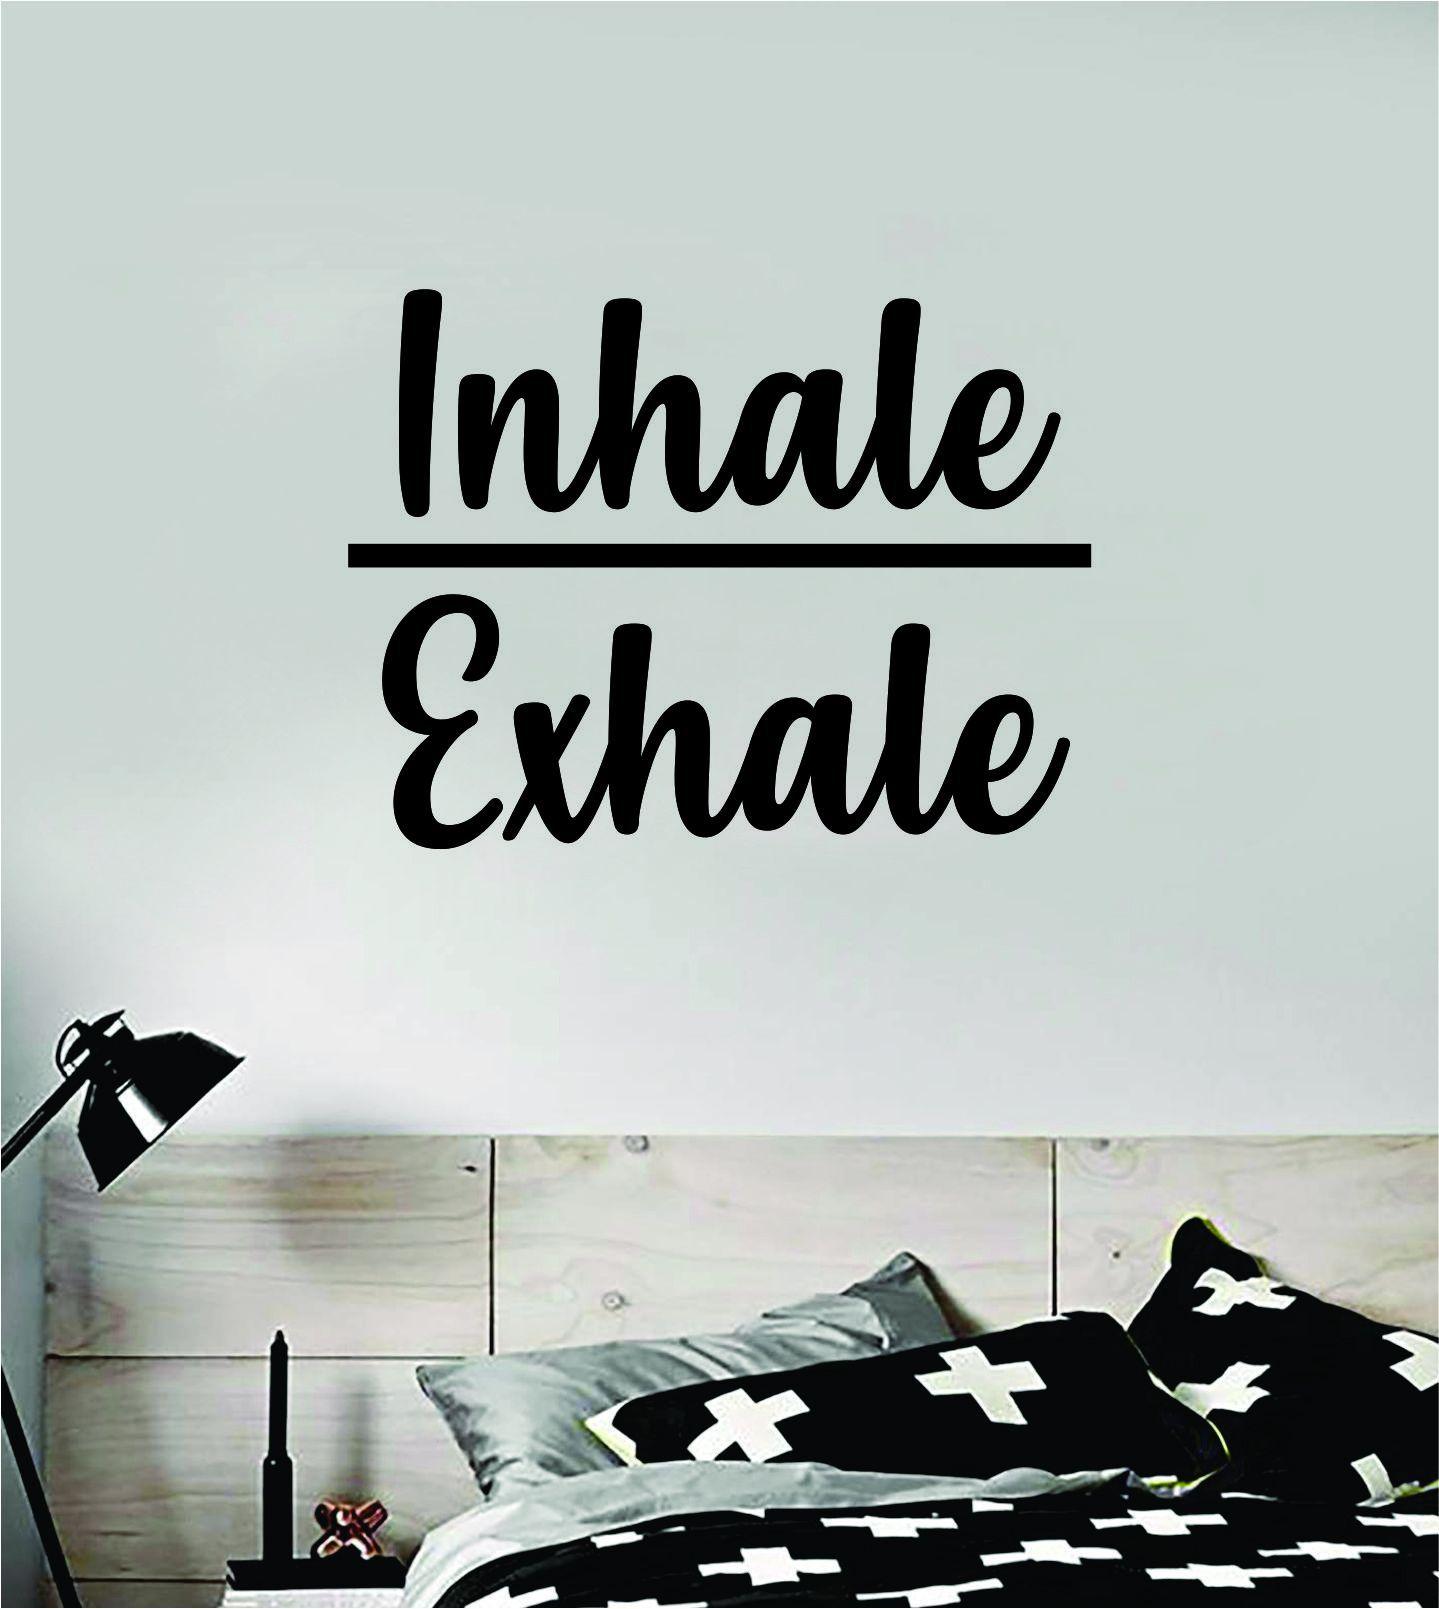 Inhale Exhale v2 Quote Decal Sticker Wall Vinyl Art Decor Room Teen Kids Namaste Yoga Om Meditate Zen Buddha Relax Breathe - brown